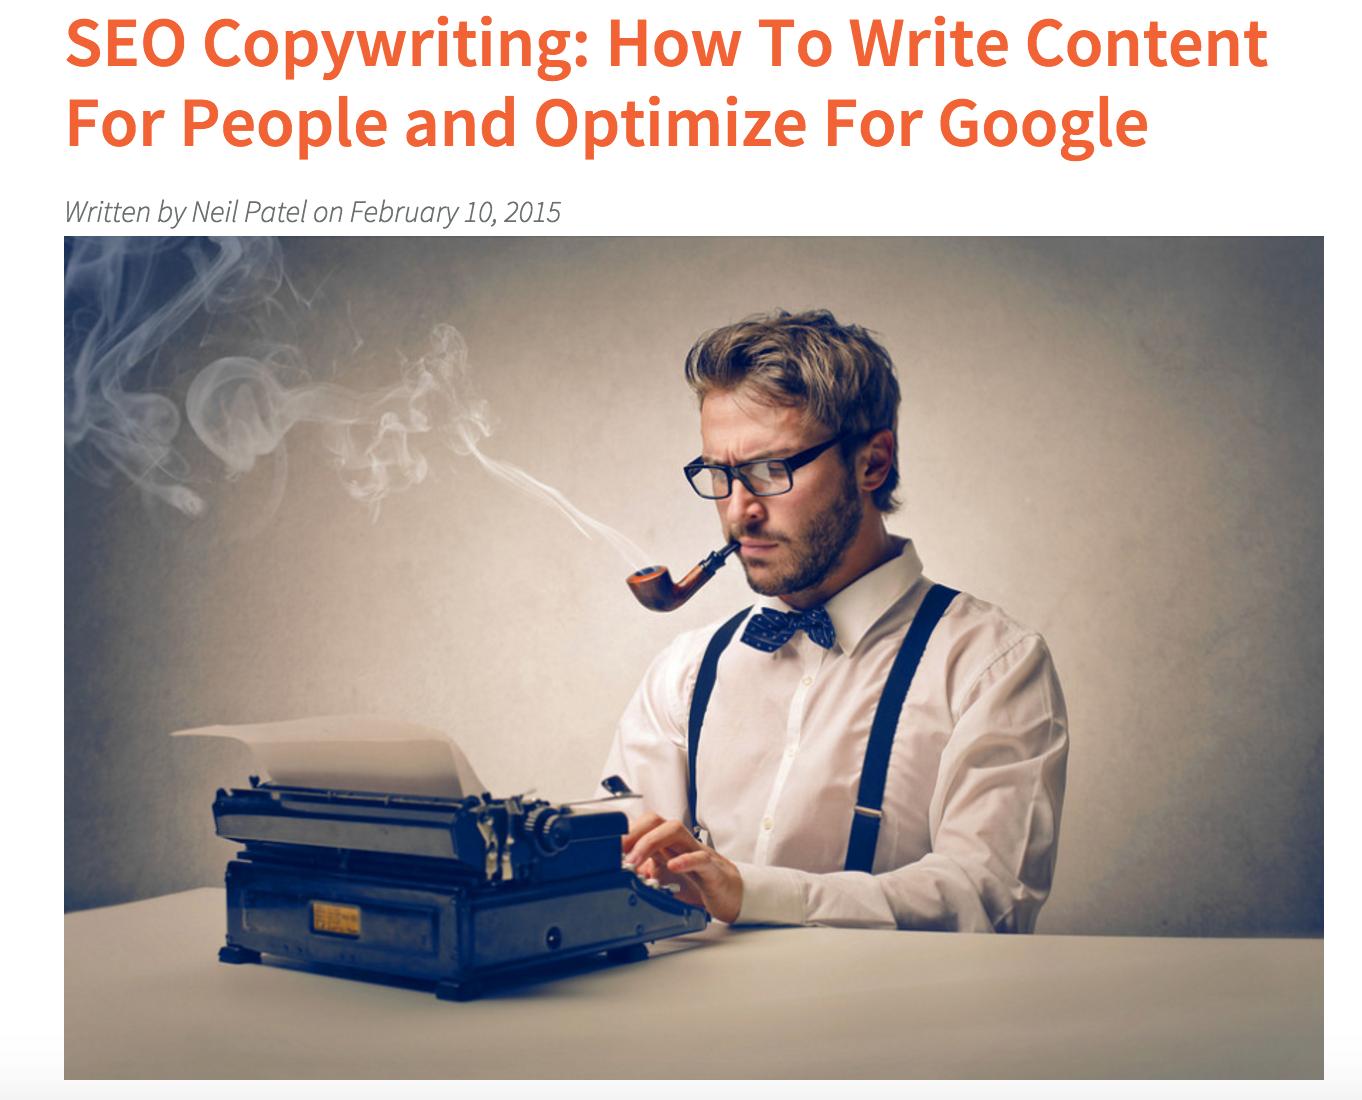 neil patel blog post on seo copywriting